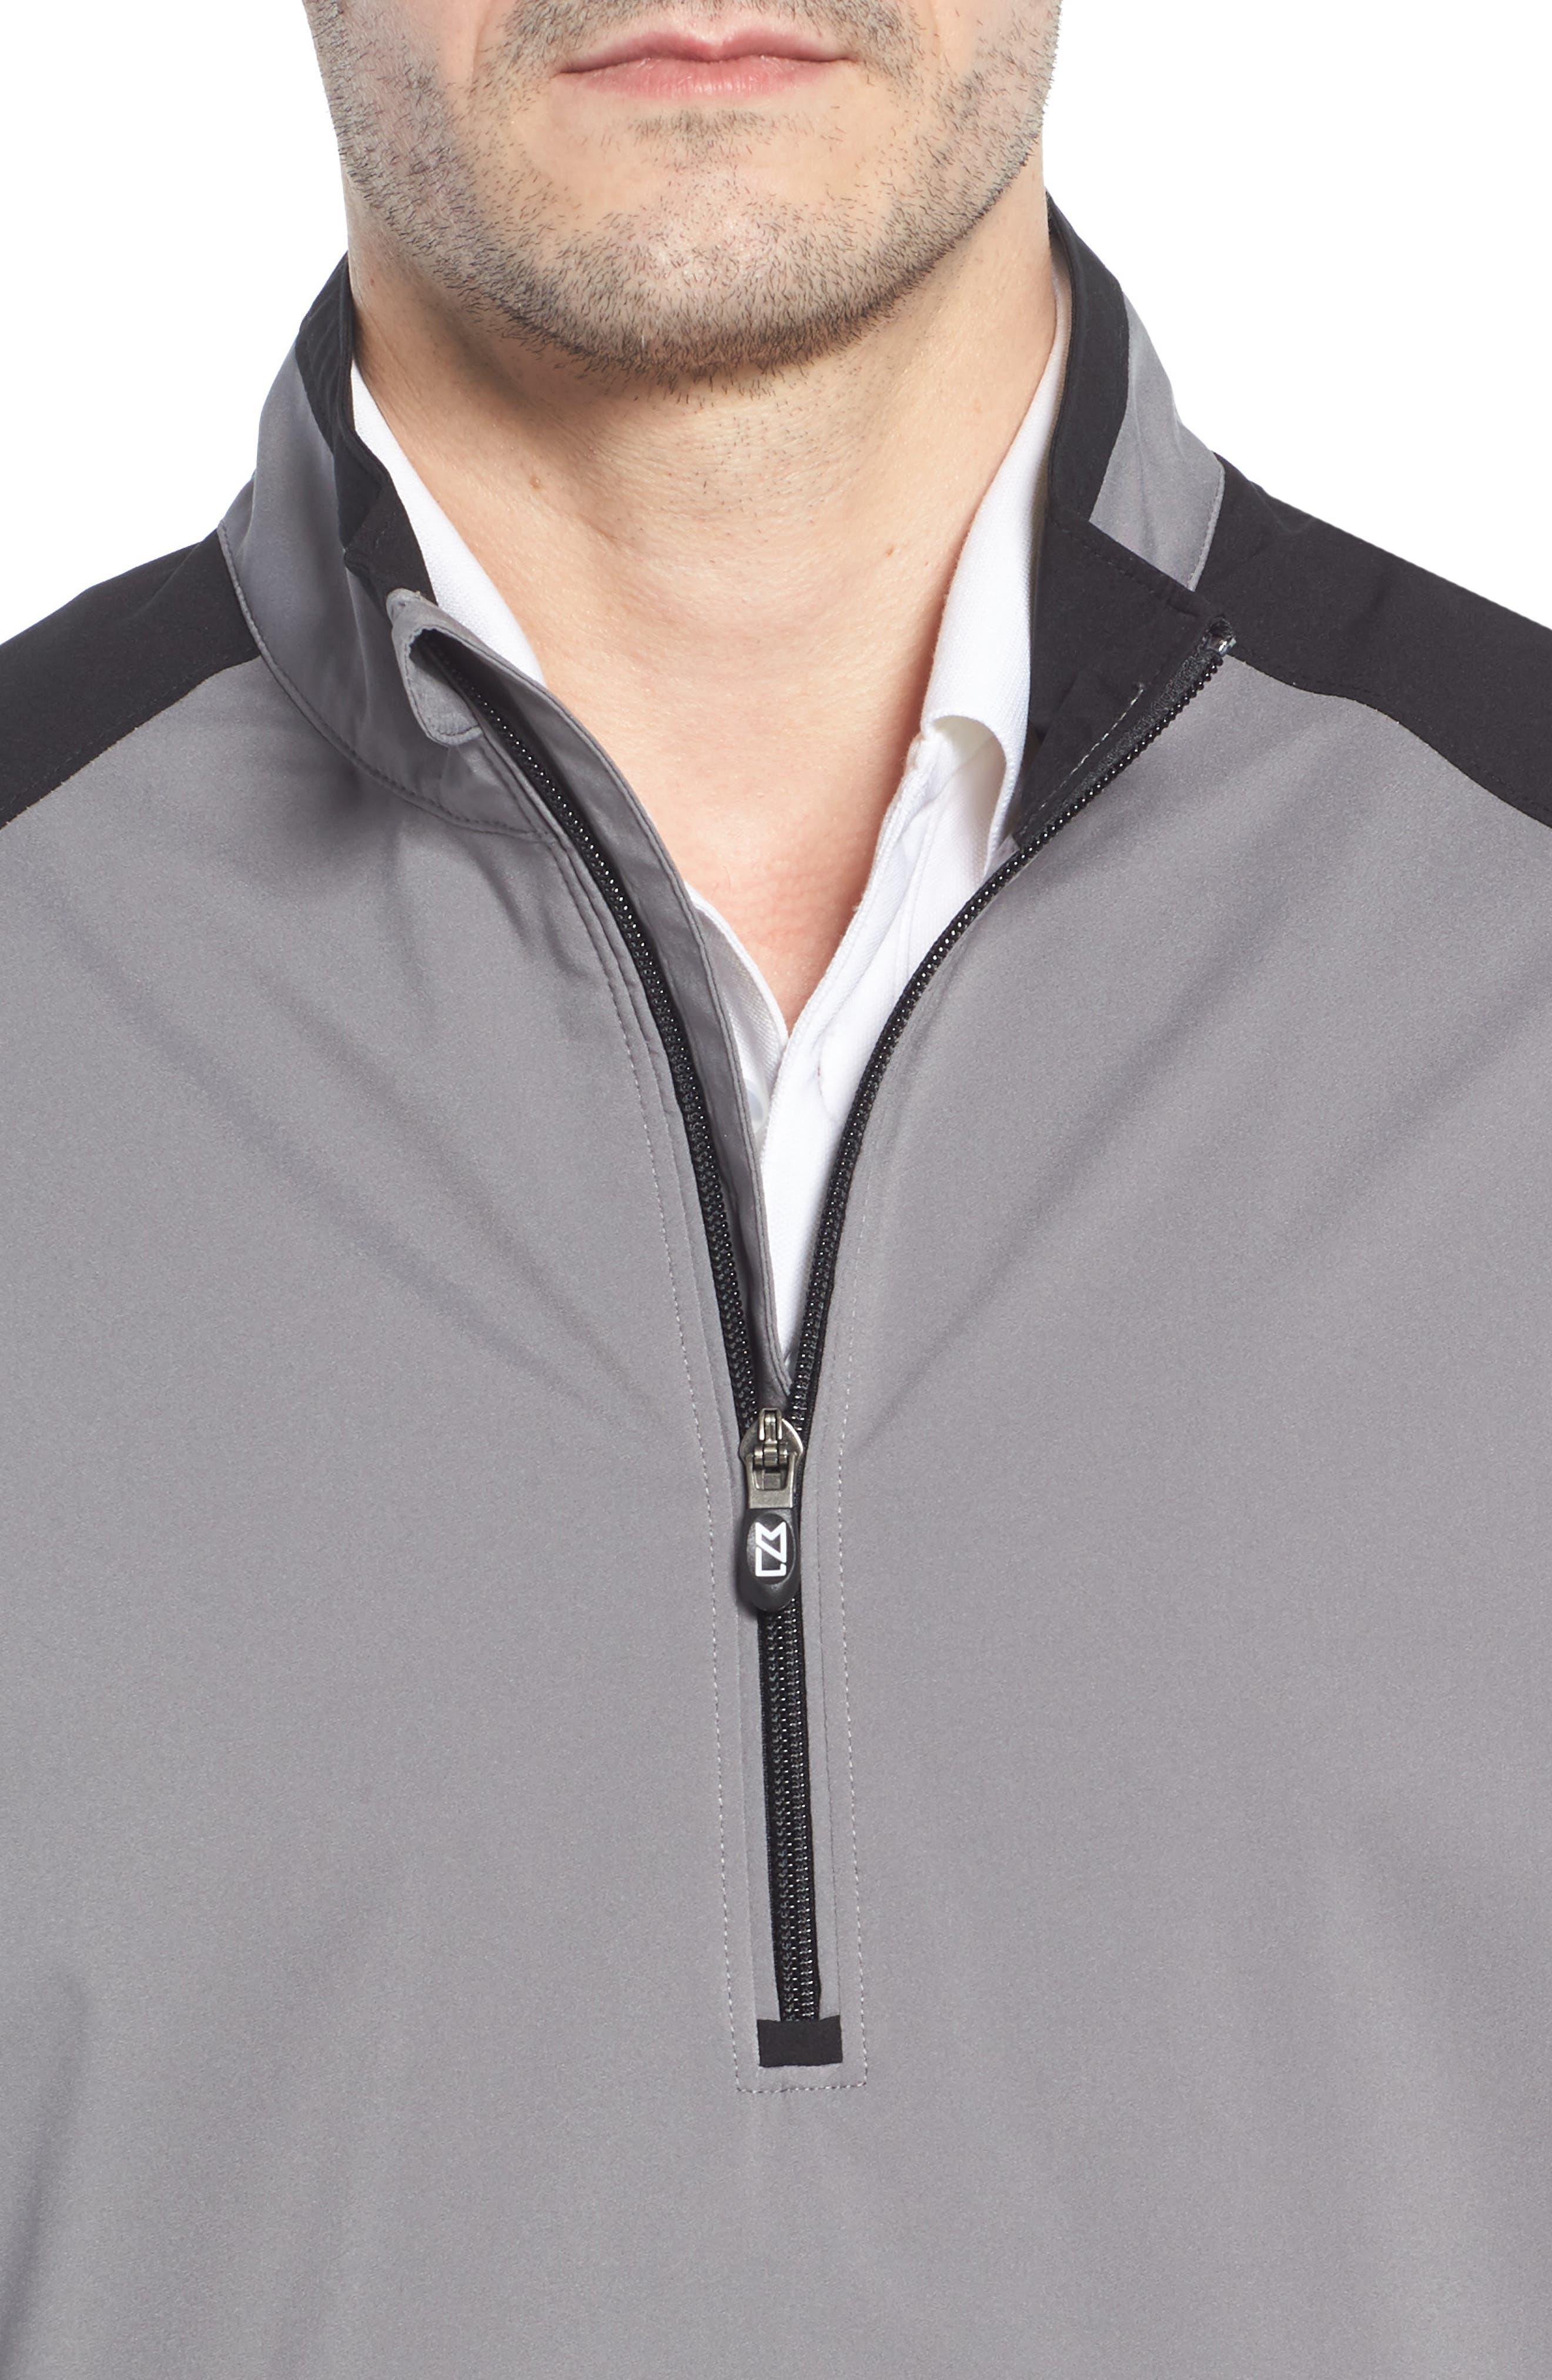 'Summit' WeatherTec Wind & Water Resistant Half Zip Jacket,                             Alternate thumbnail 4, color,                             Gravel